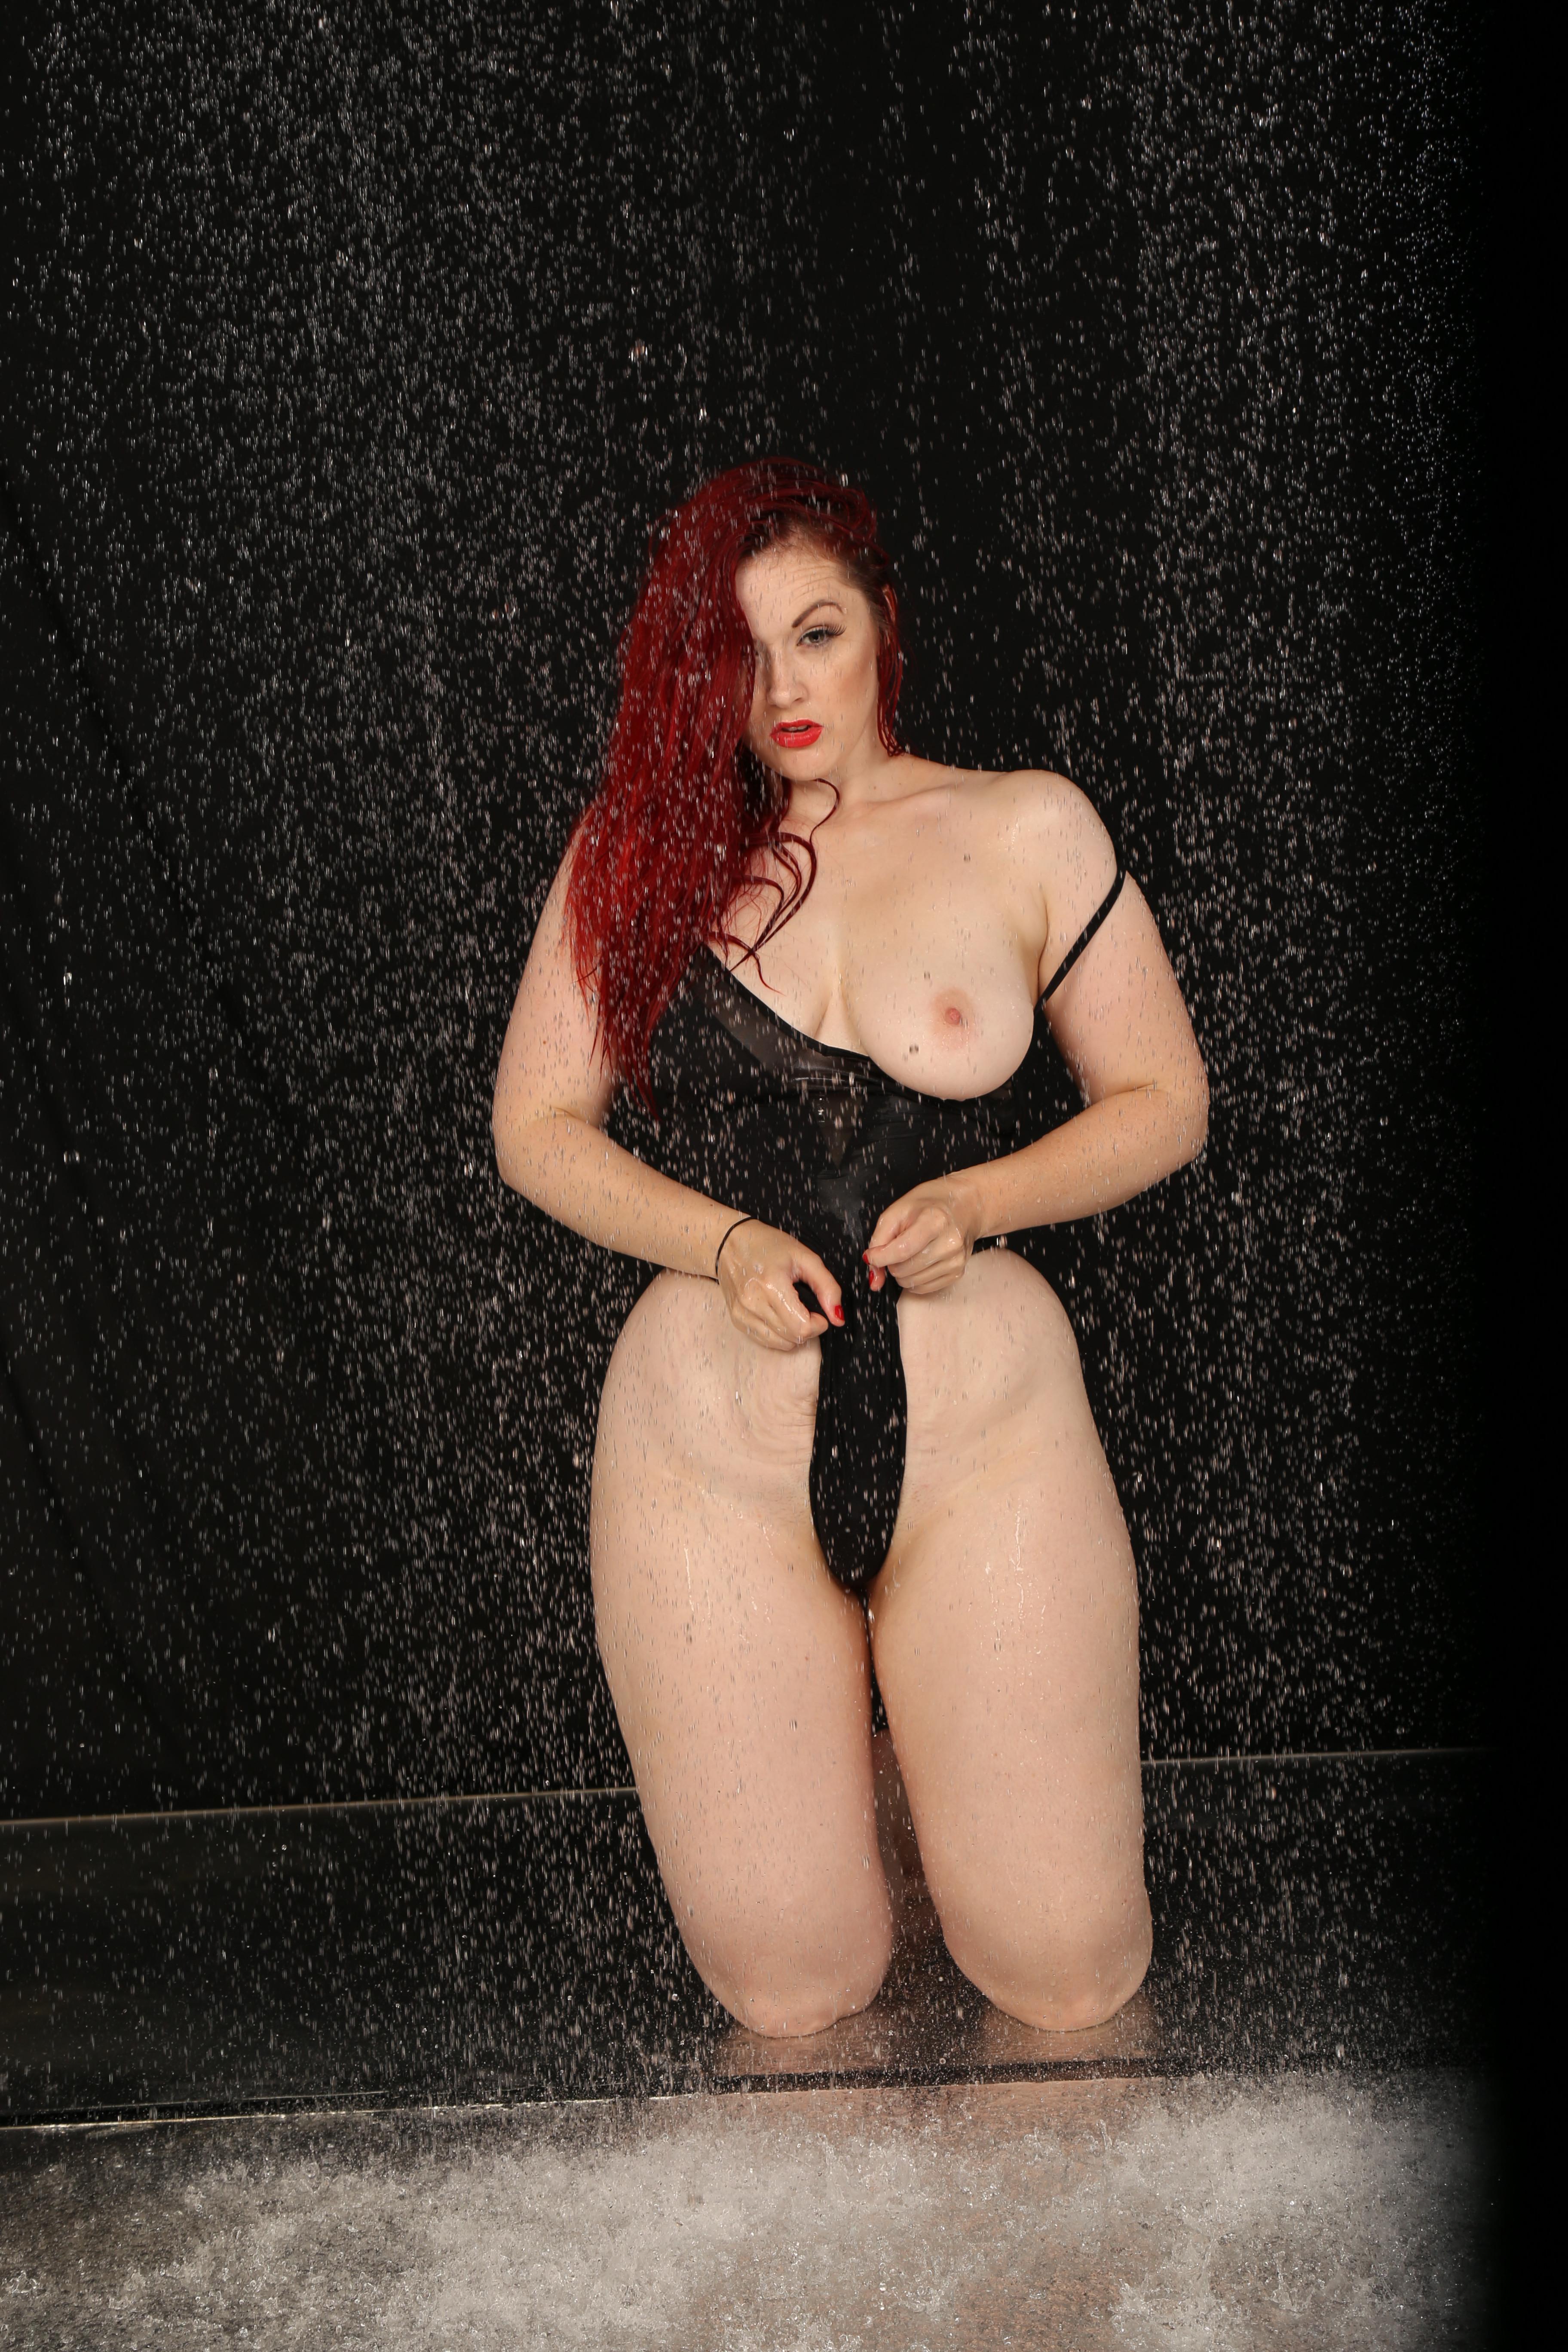 Jaye rose nude